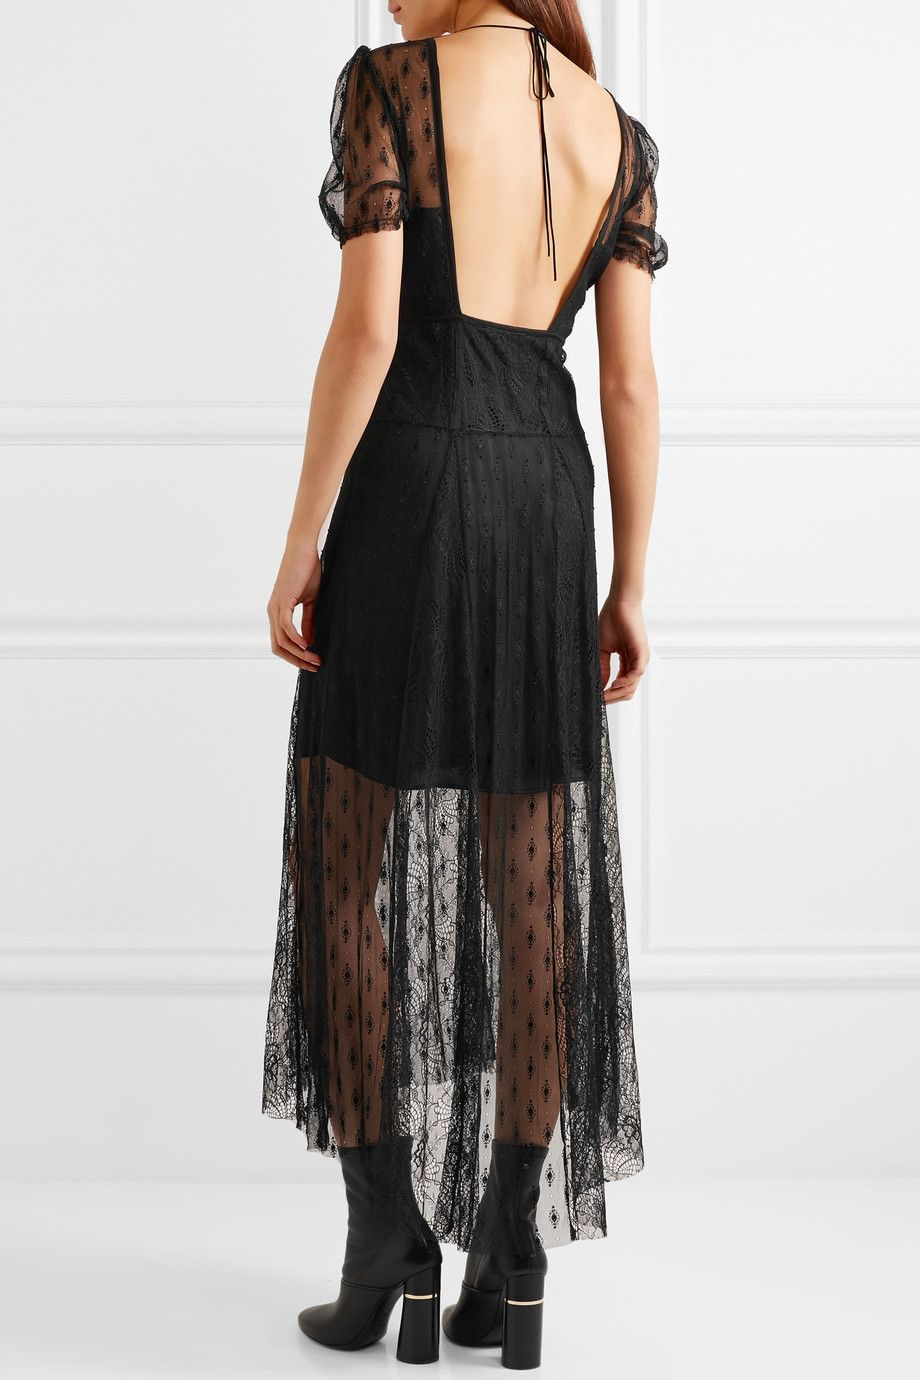 Open-back Embroidered Lace Midi Dress - Black Maje M4wHqy6O